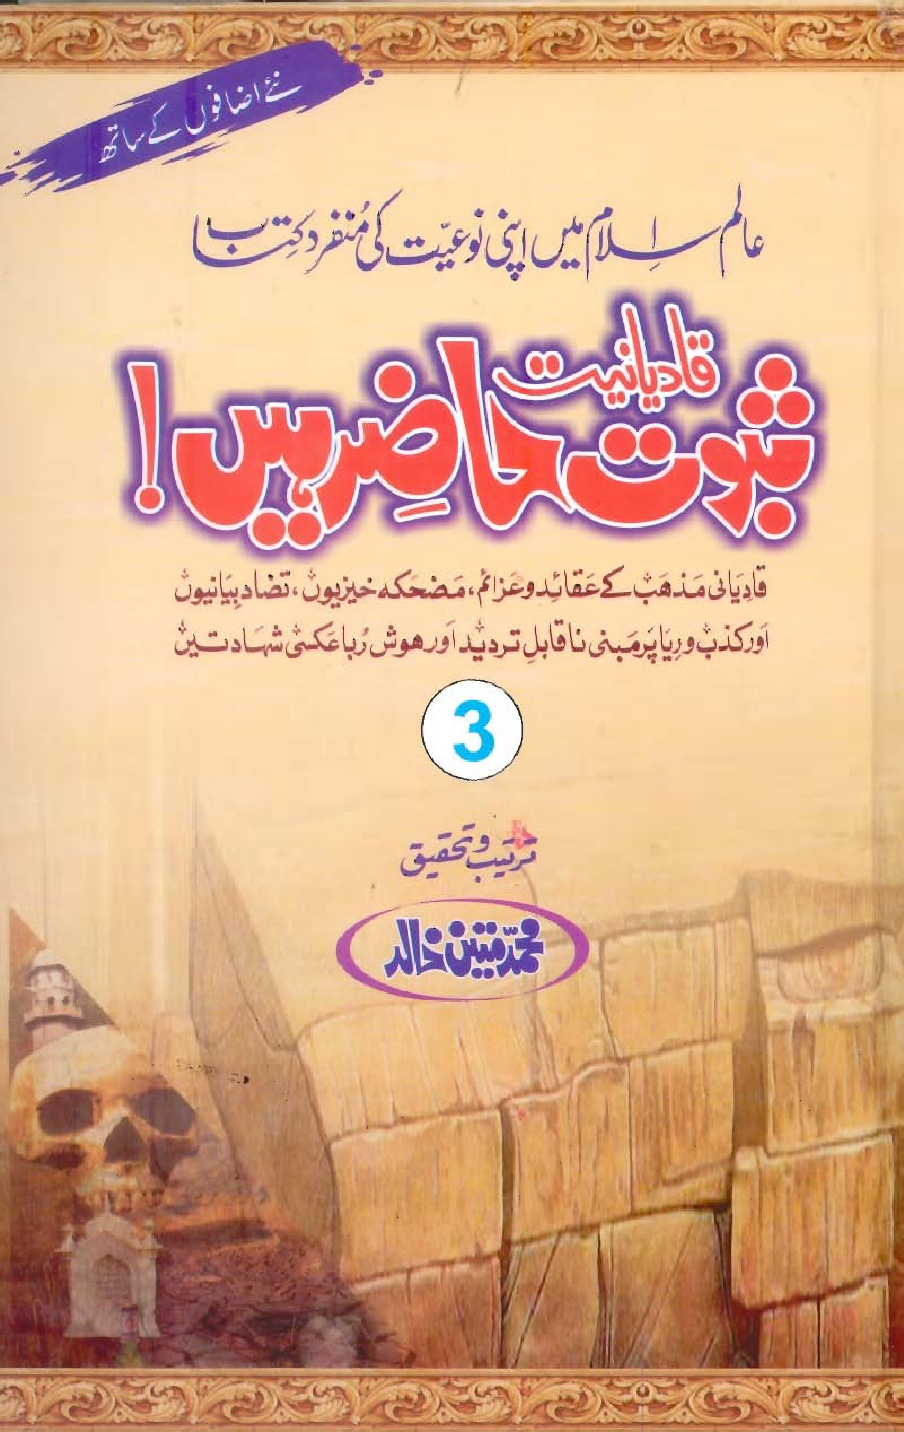 Qadianiat Saboot Hazir Hain J 3